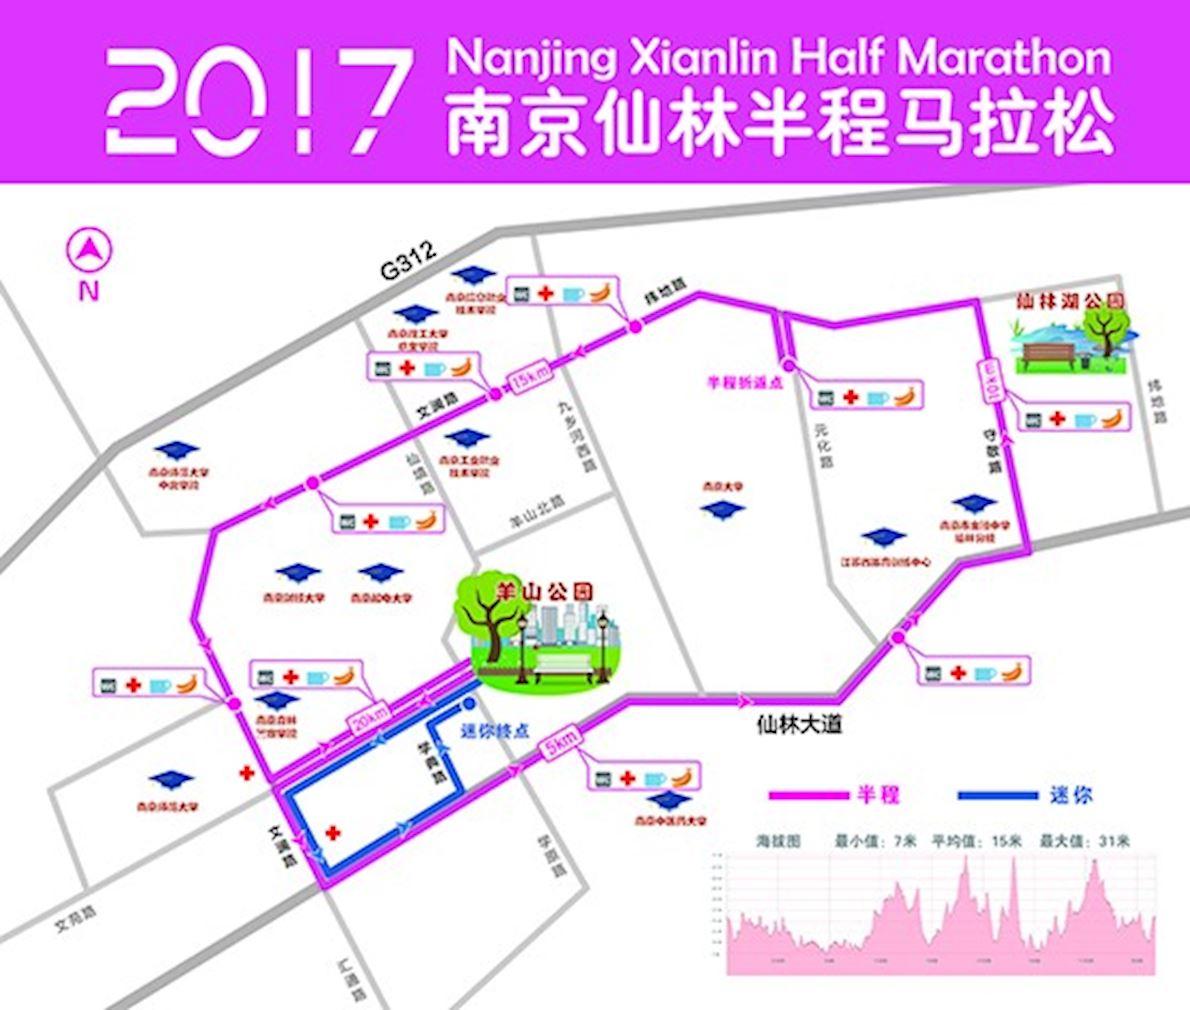 Nanjing Xianlin Half Marathon MAPA DEL RECORRIDO DE